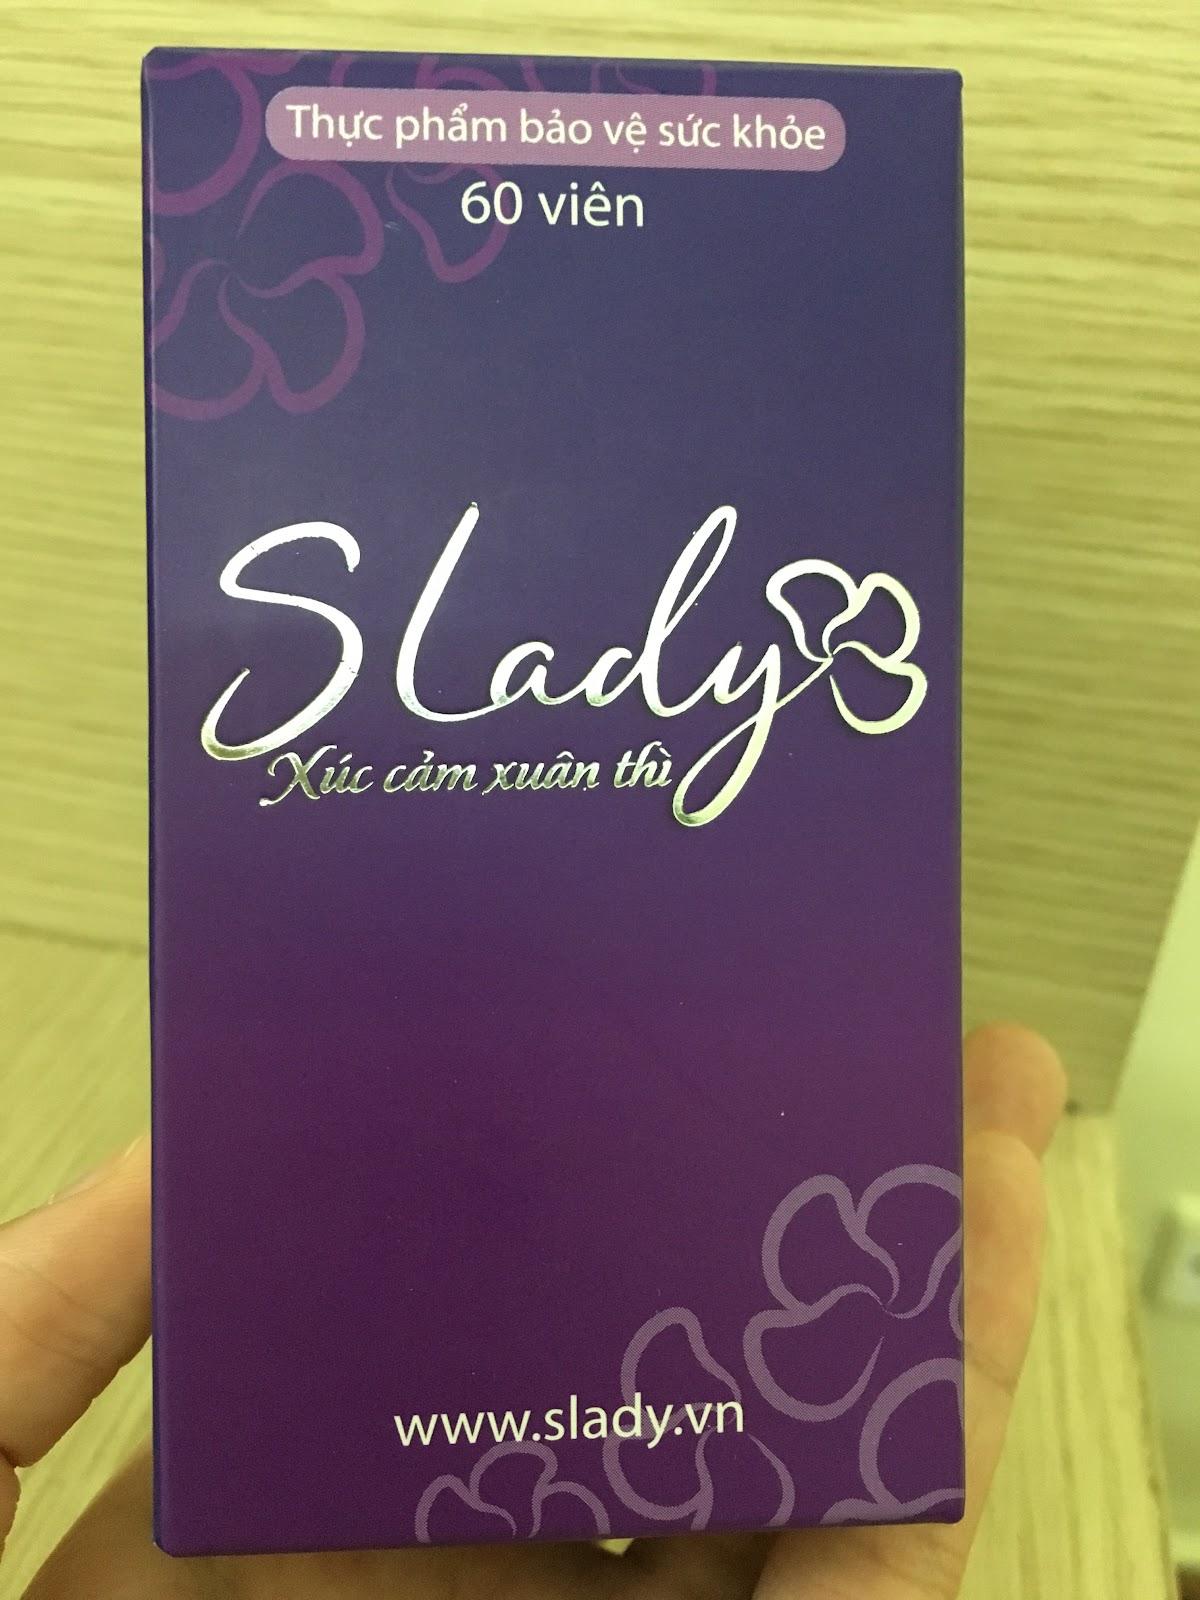 Vỏ hộp của SLady